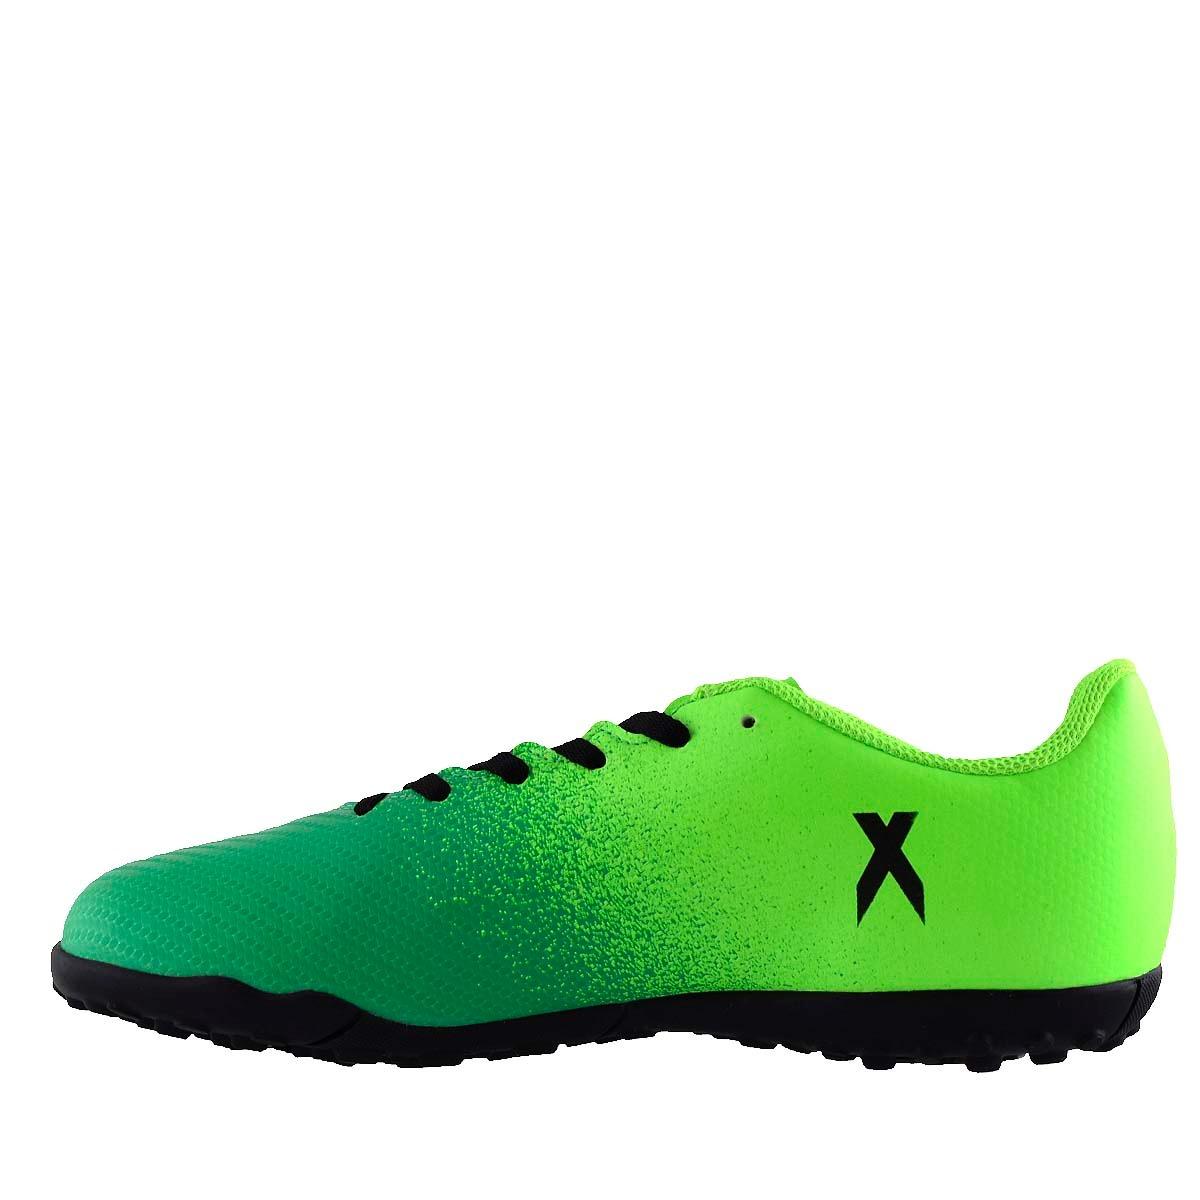 Botines adidas X 16.4 Tf Niños Verde -   1.100 5ca4b782f2097